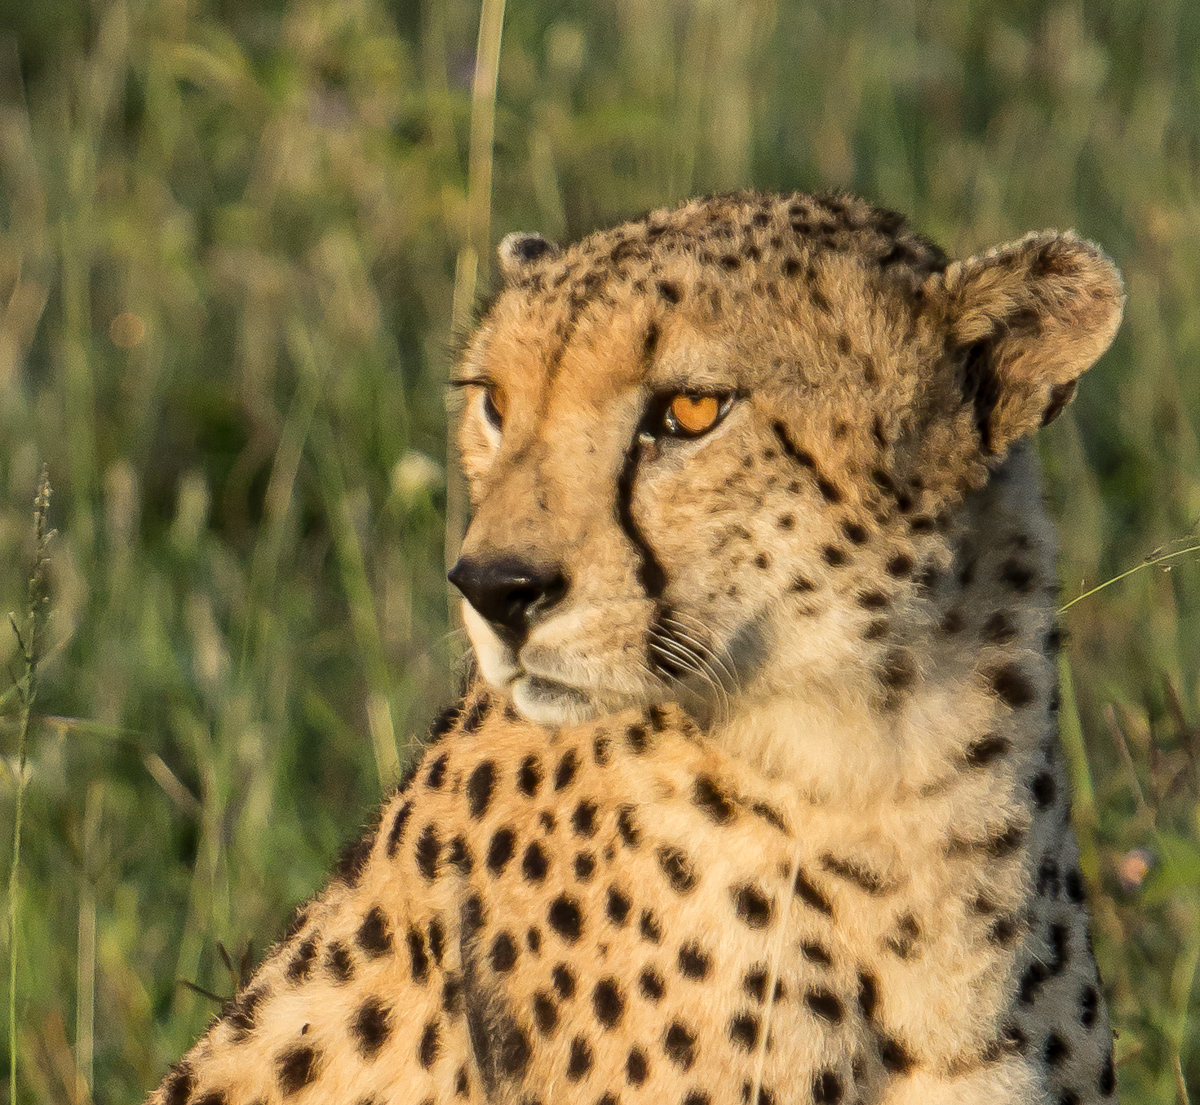 Africa-6259-Edit.jpg